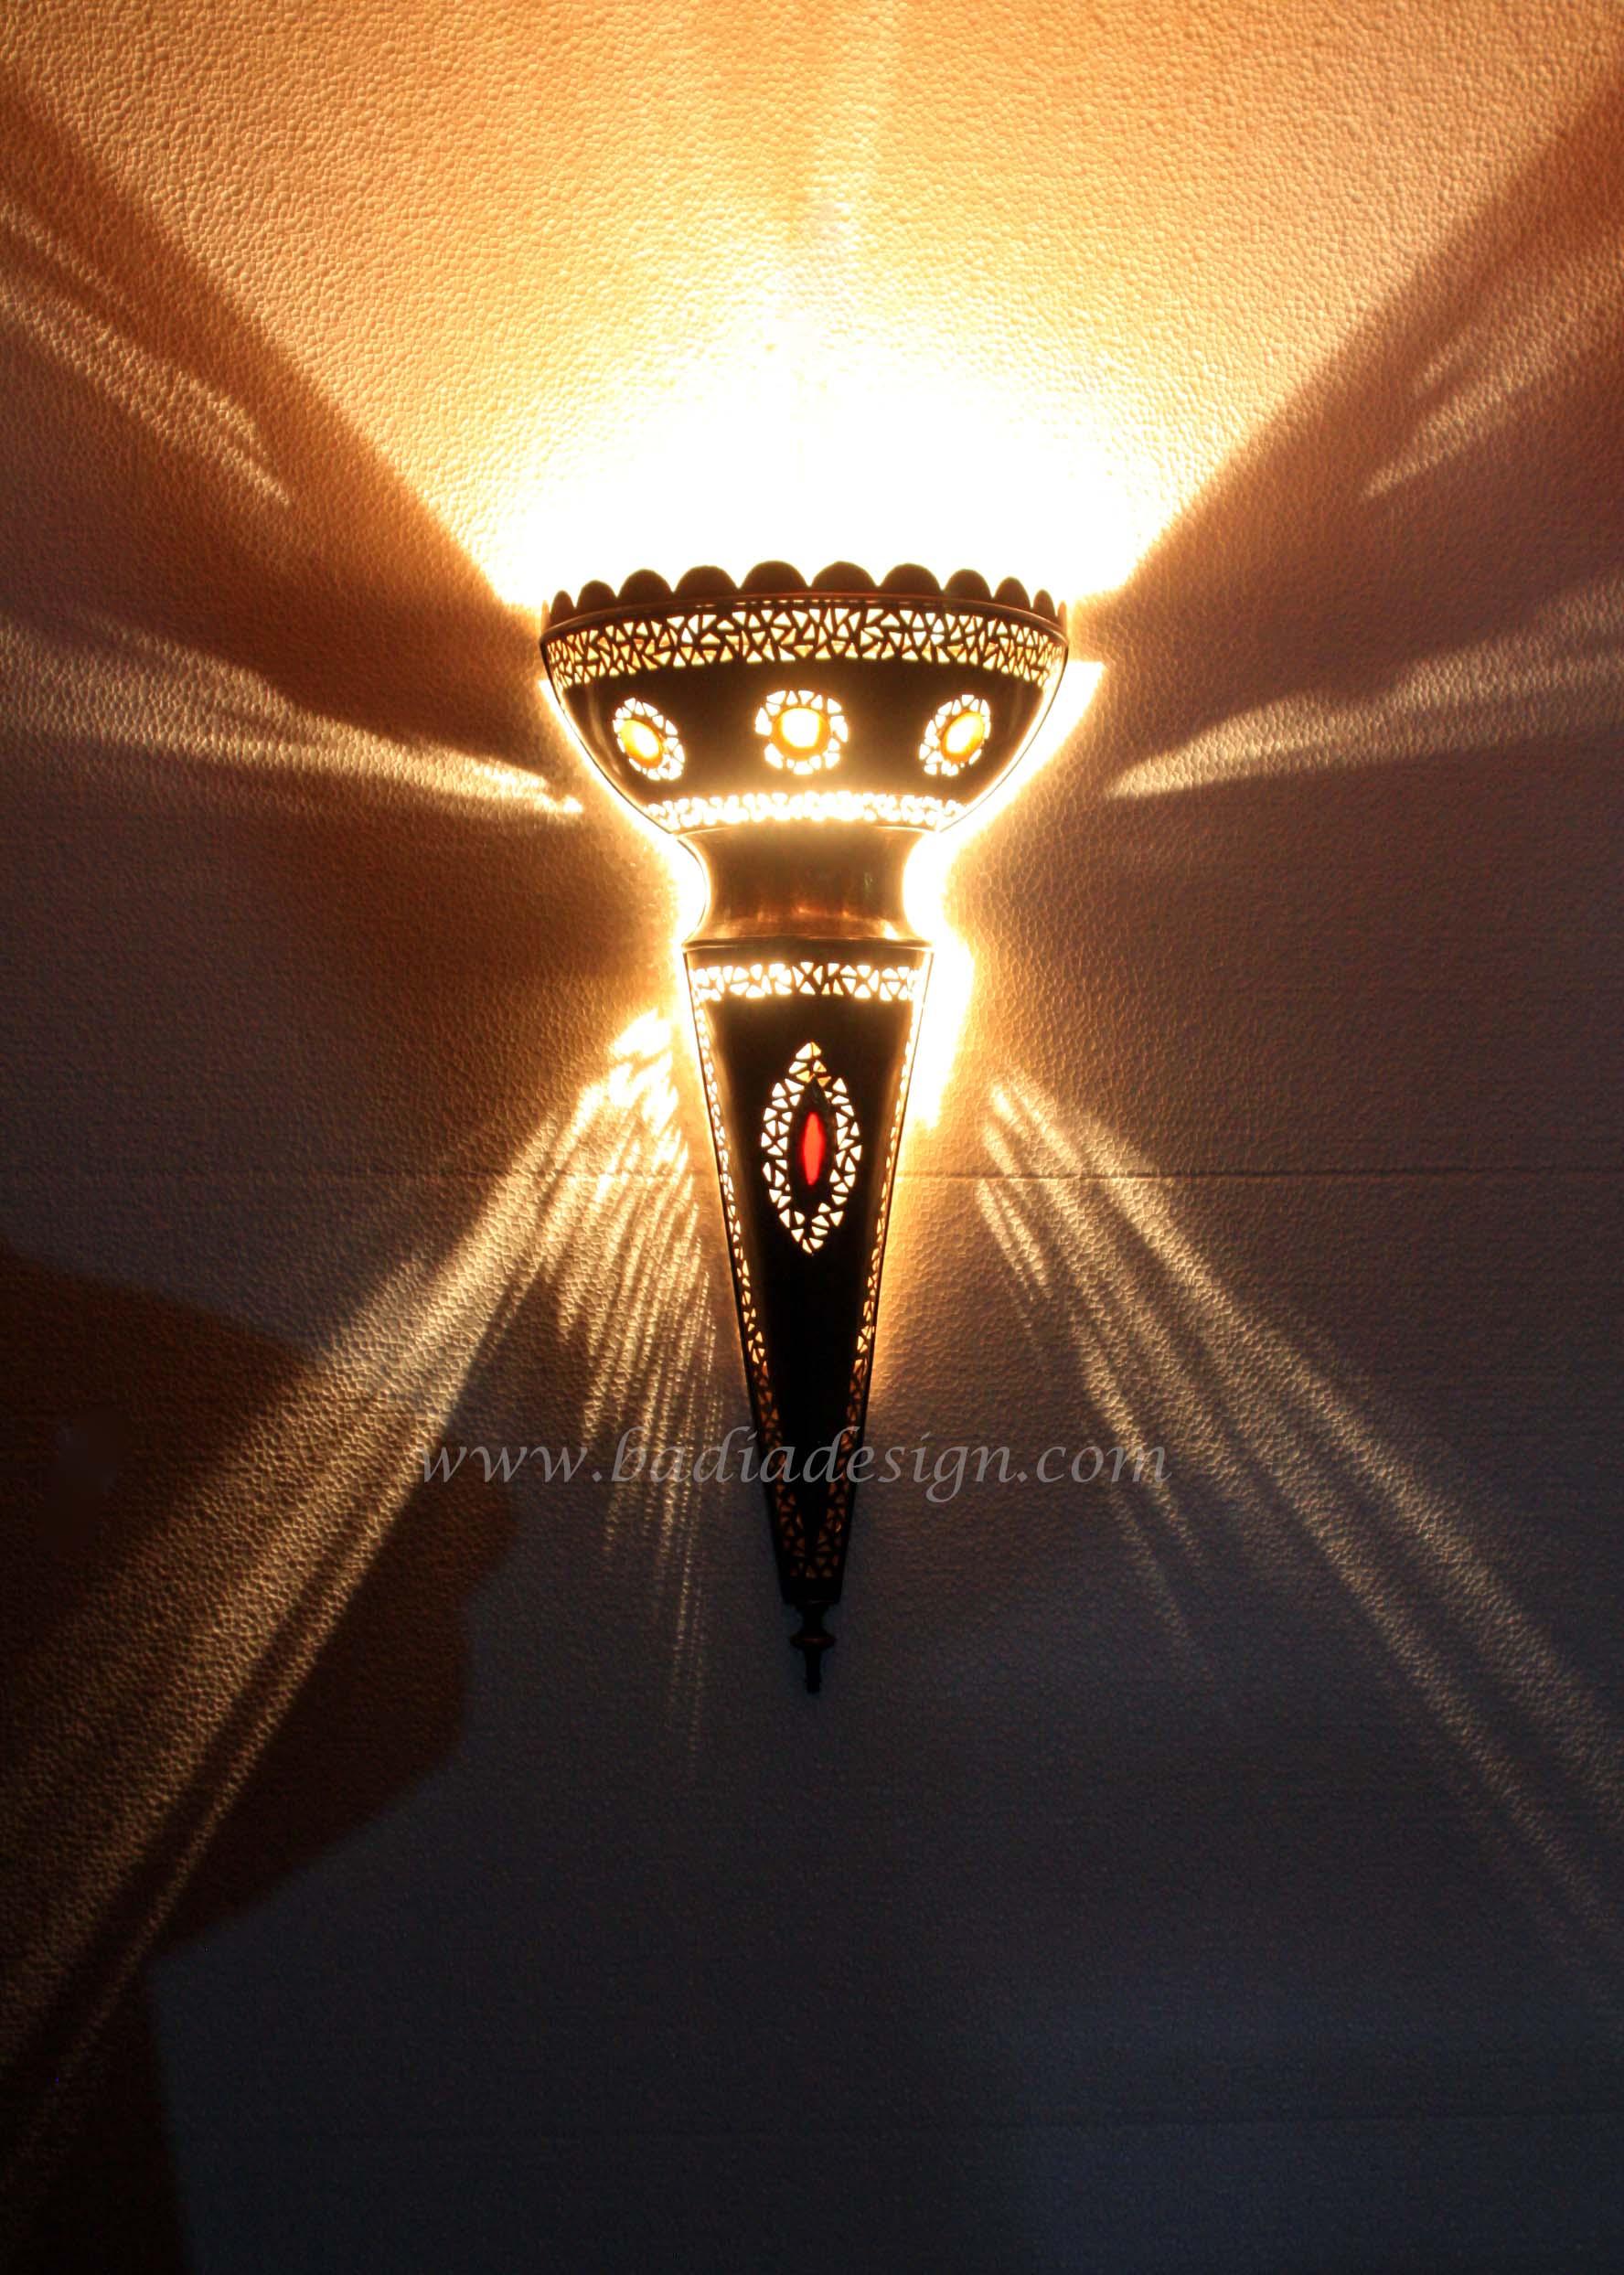 moroccan-lighting-jacksonville-florida.jpg